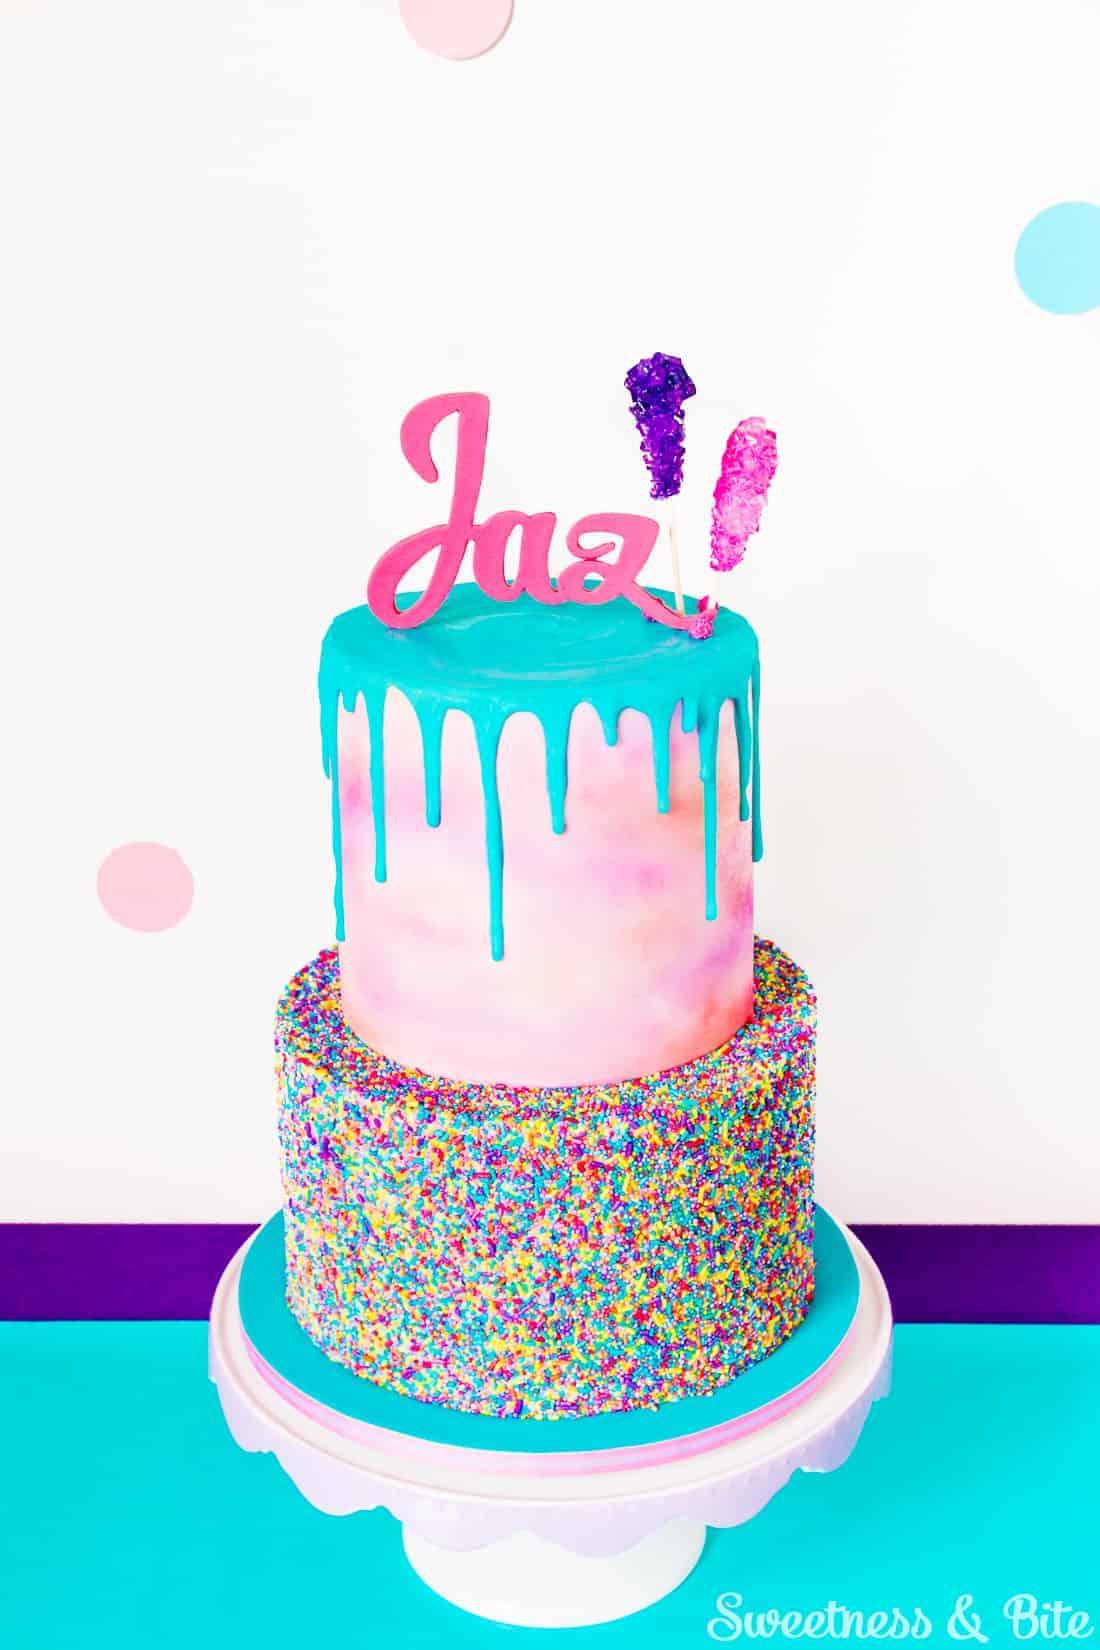 Sprinkle Watercolour Drippy Cake By Sweetness & Bite